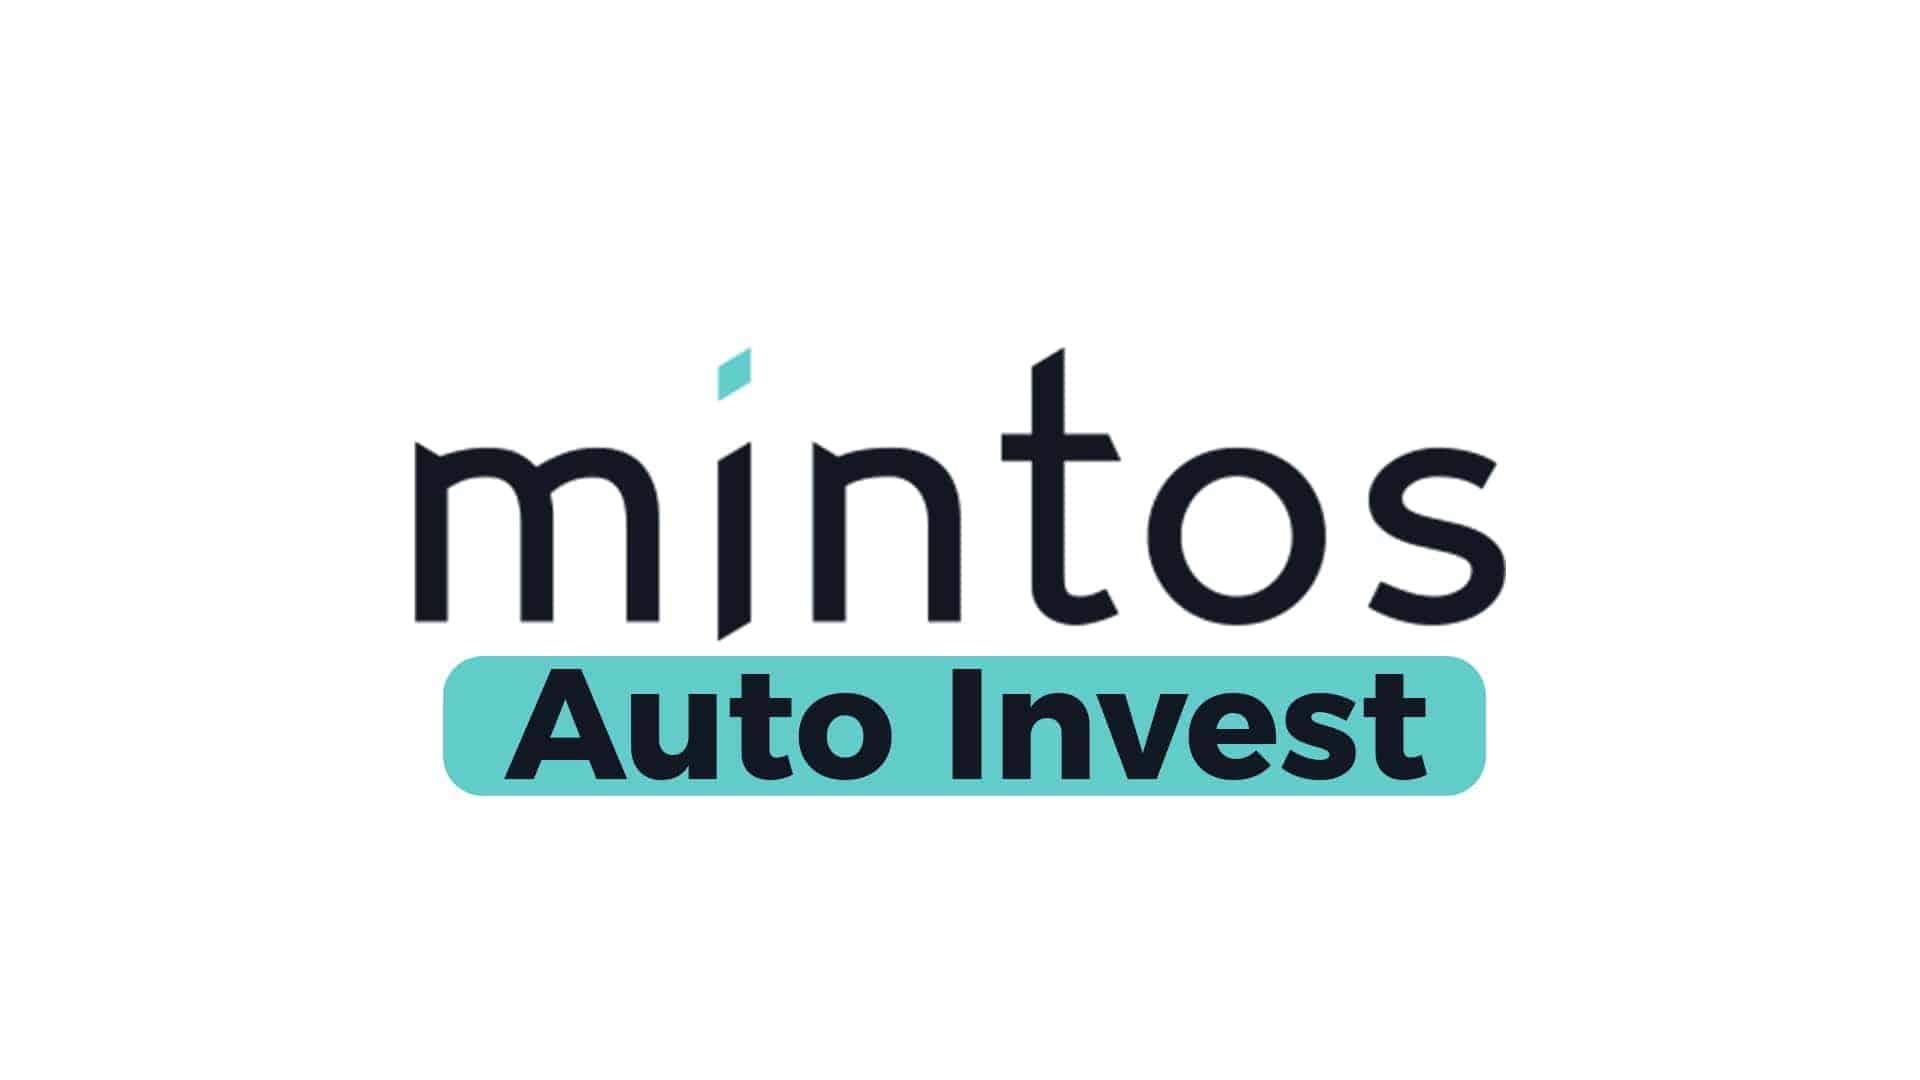 mintos-auto-invest